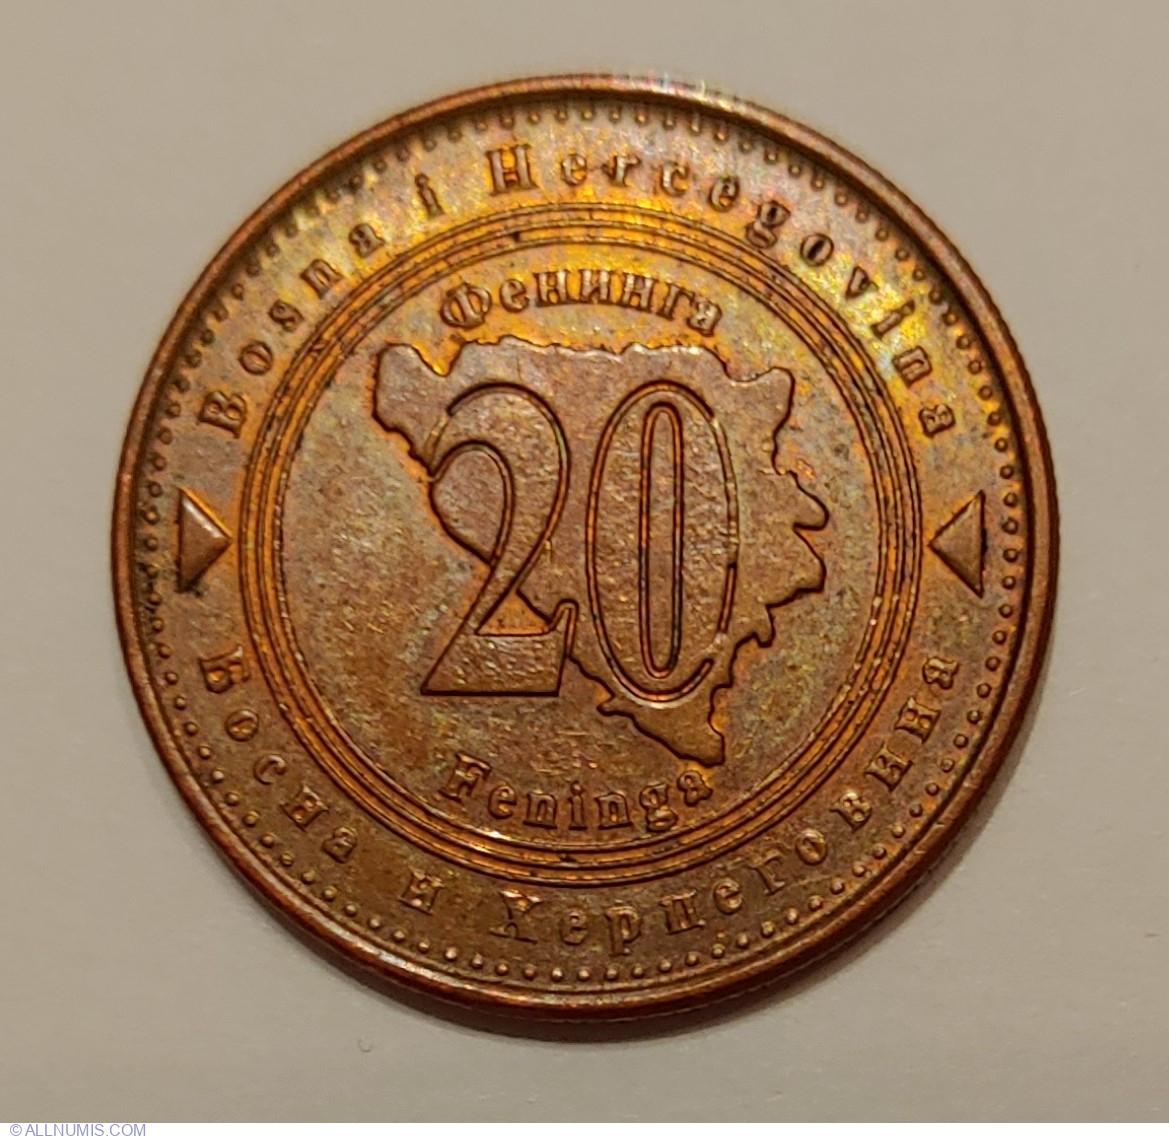 20 Feninga 2017, Bosnian Mark 1998-present - Bosnia and